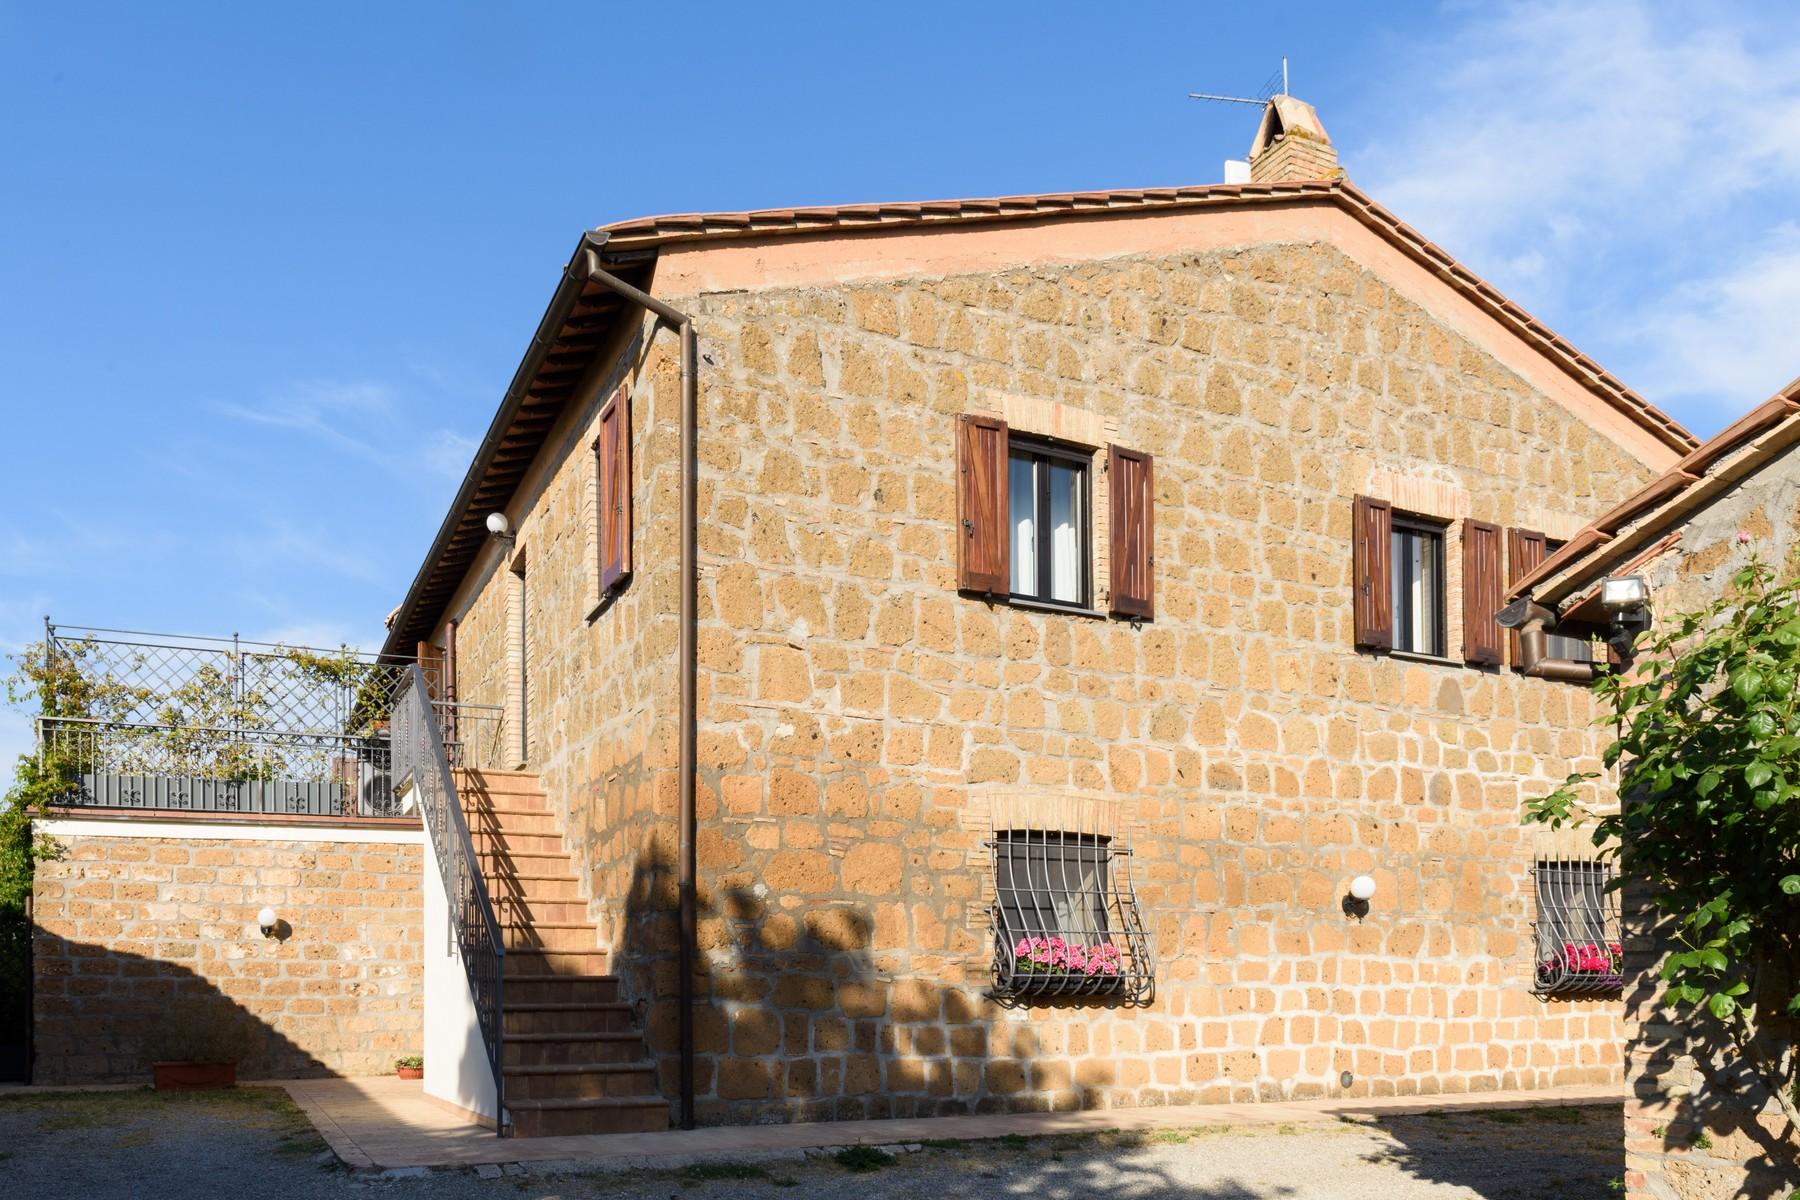 Casa indipendente in Vendita a Castel Viscardo: 5 locali, 700 mq - Foto 5